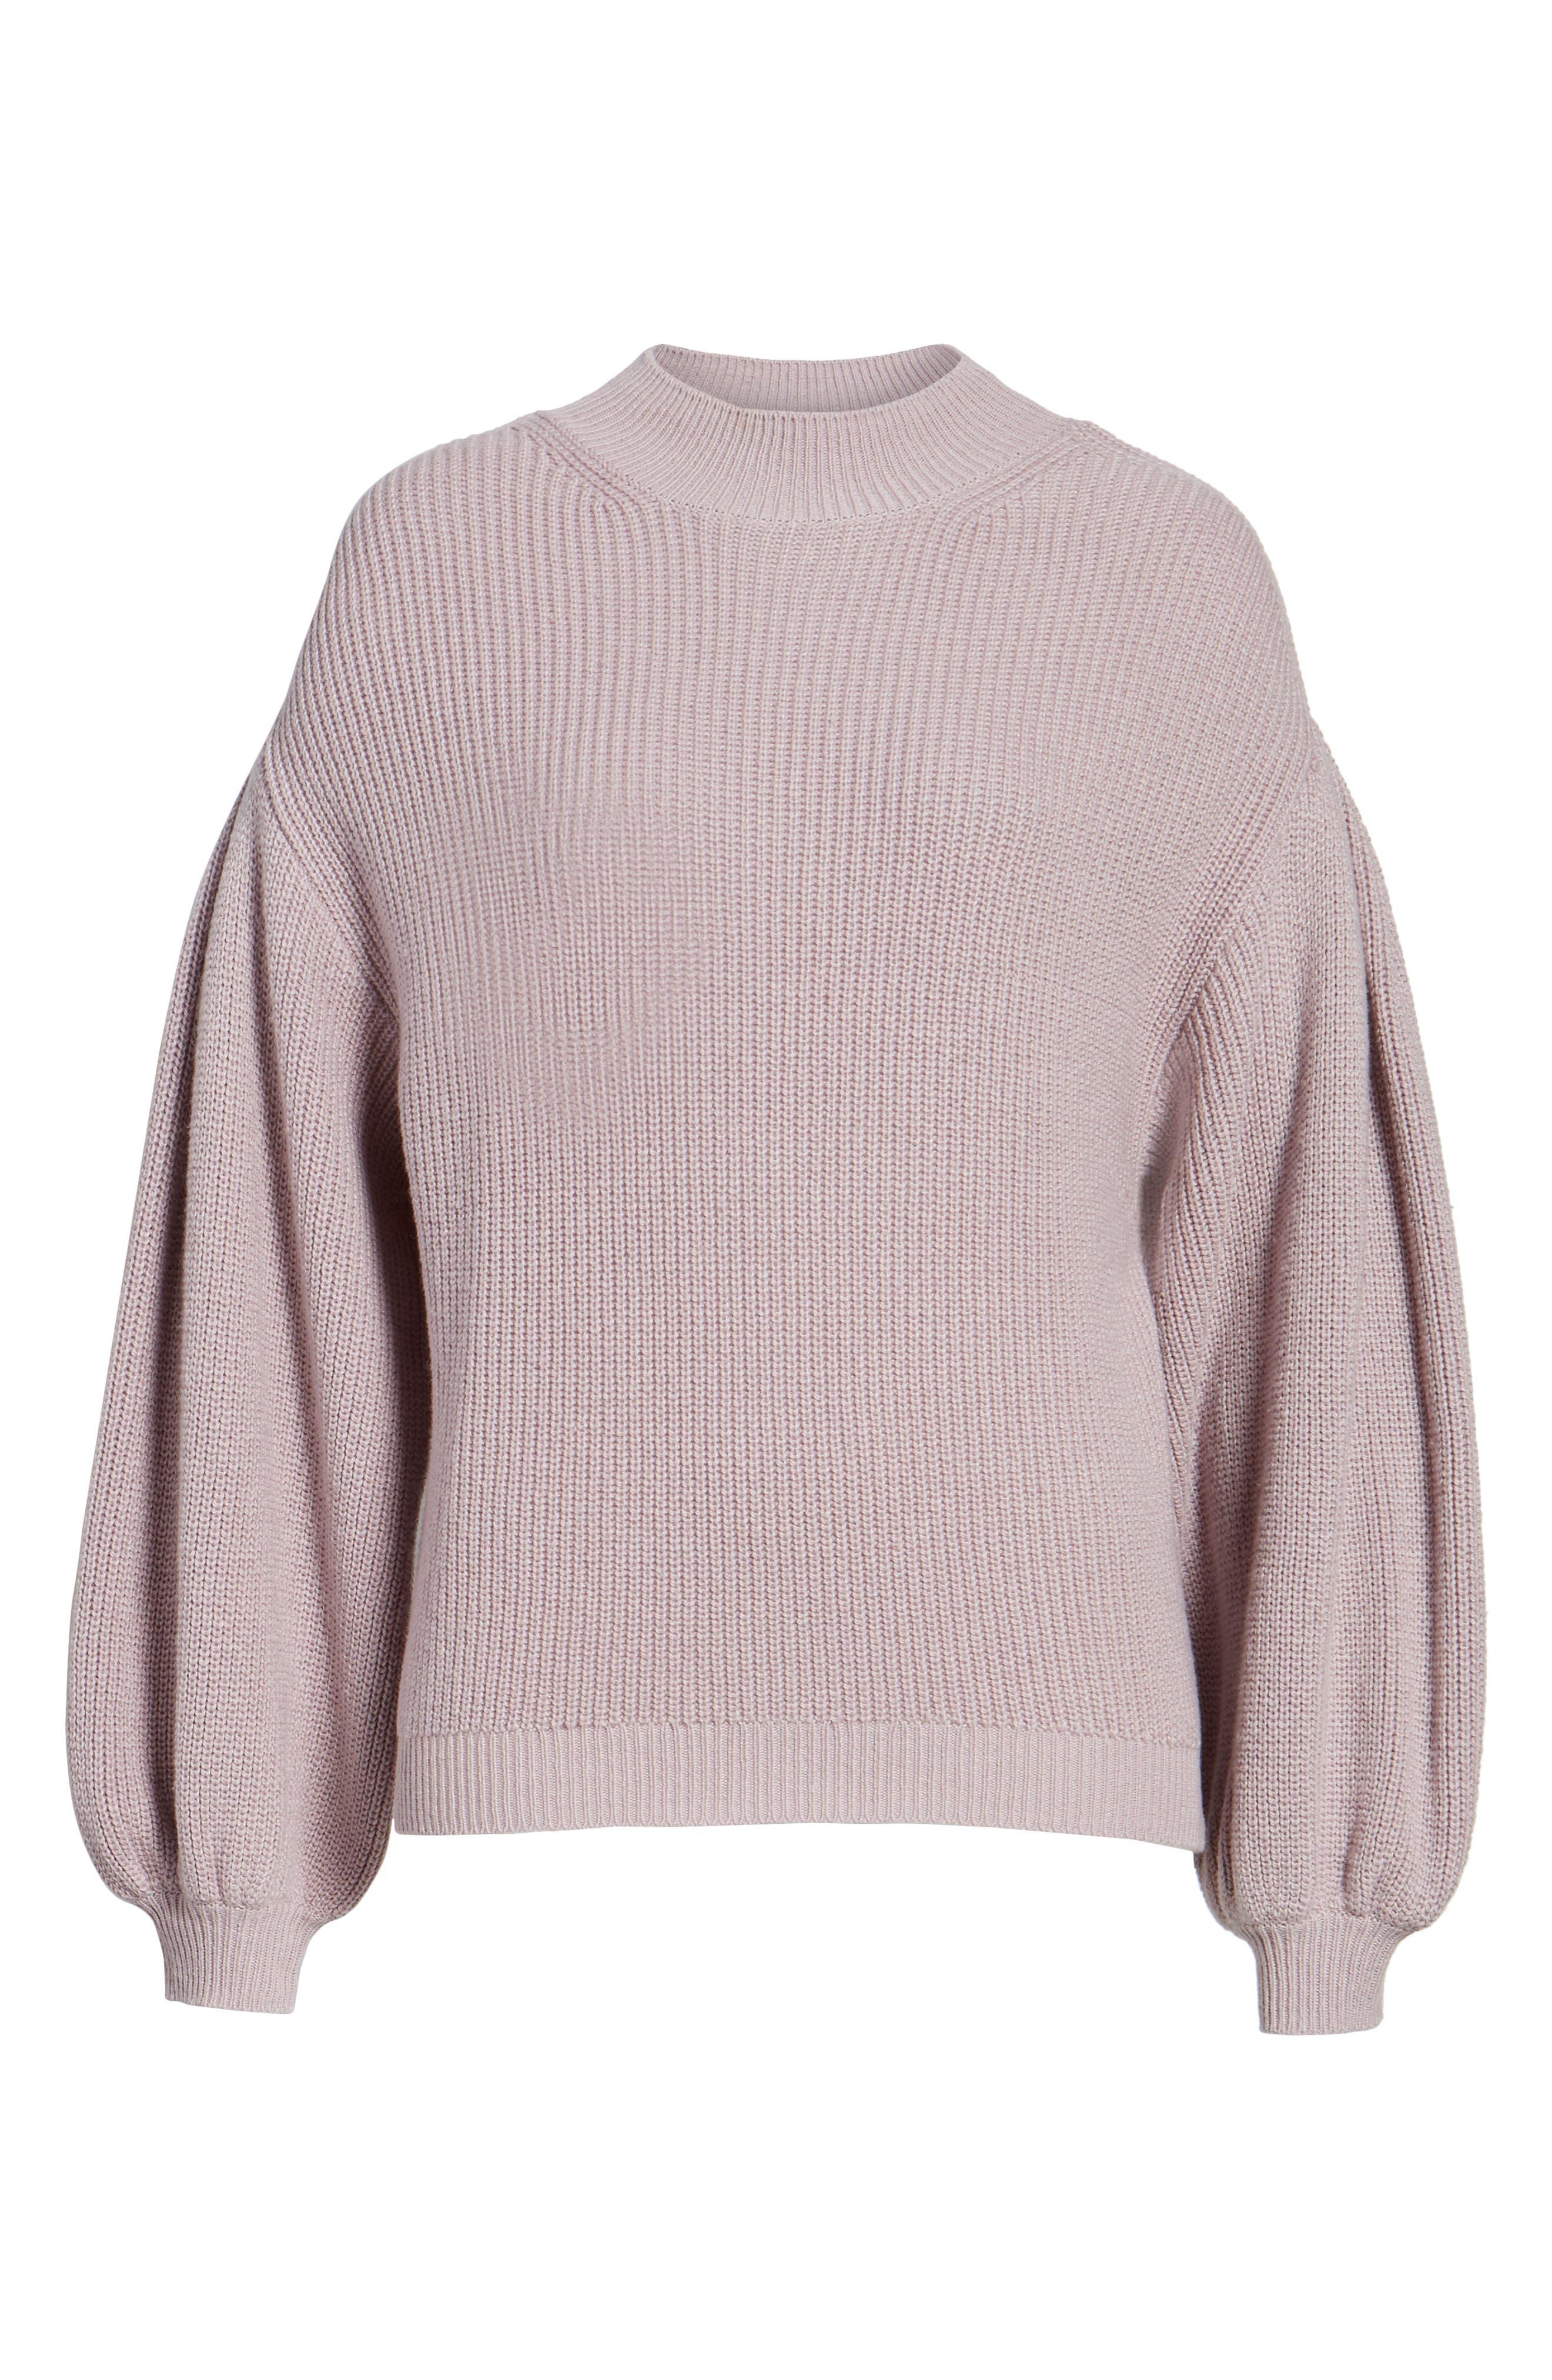 Blouson Sleeve Sweater,                             Alternate thumbnail 29, color,